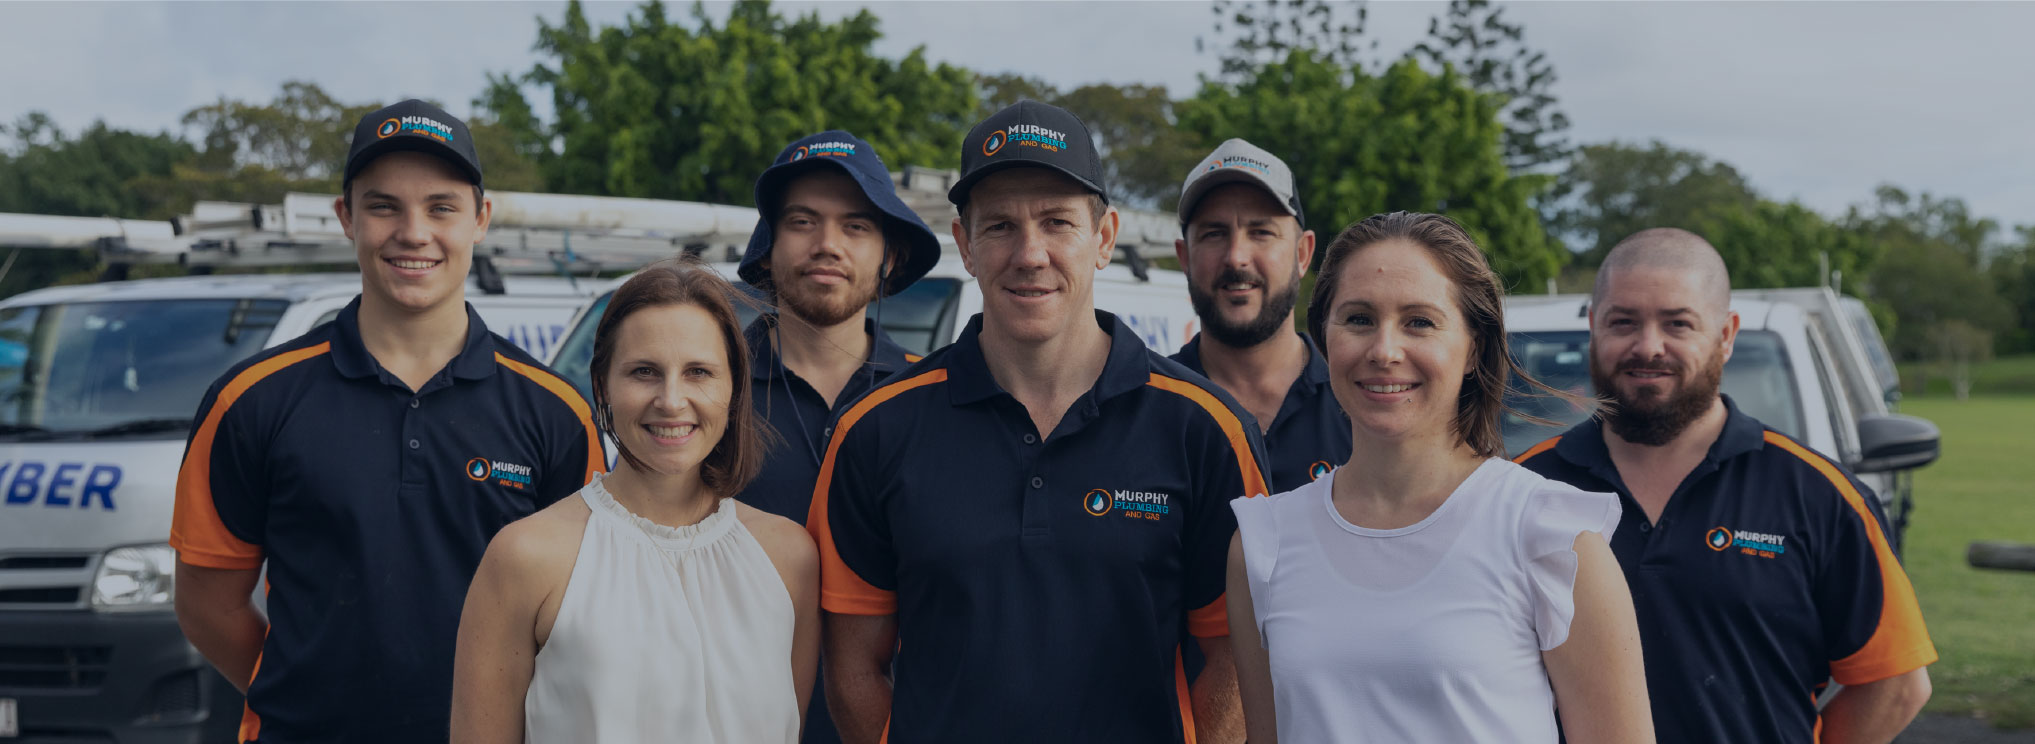 murphy plumbing and gas team photo